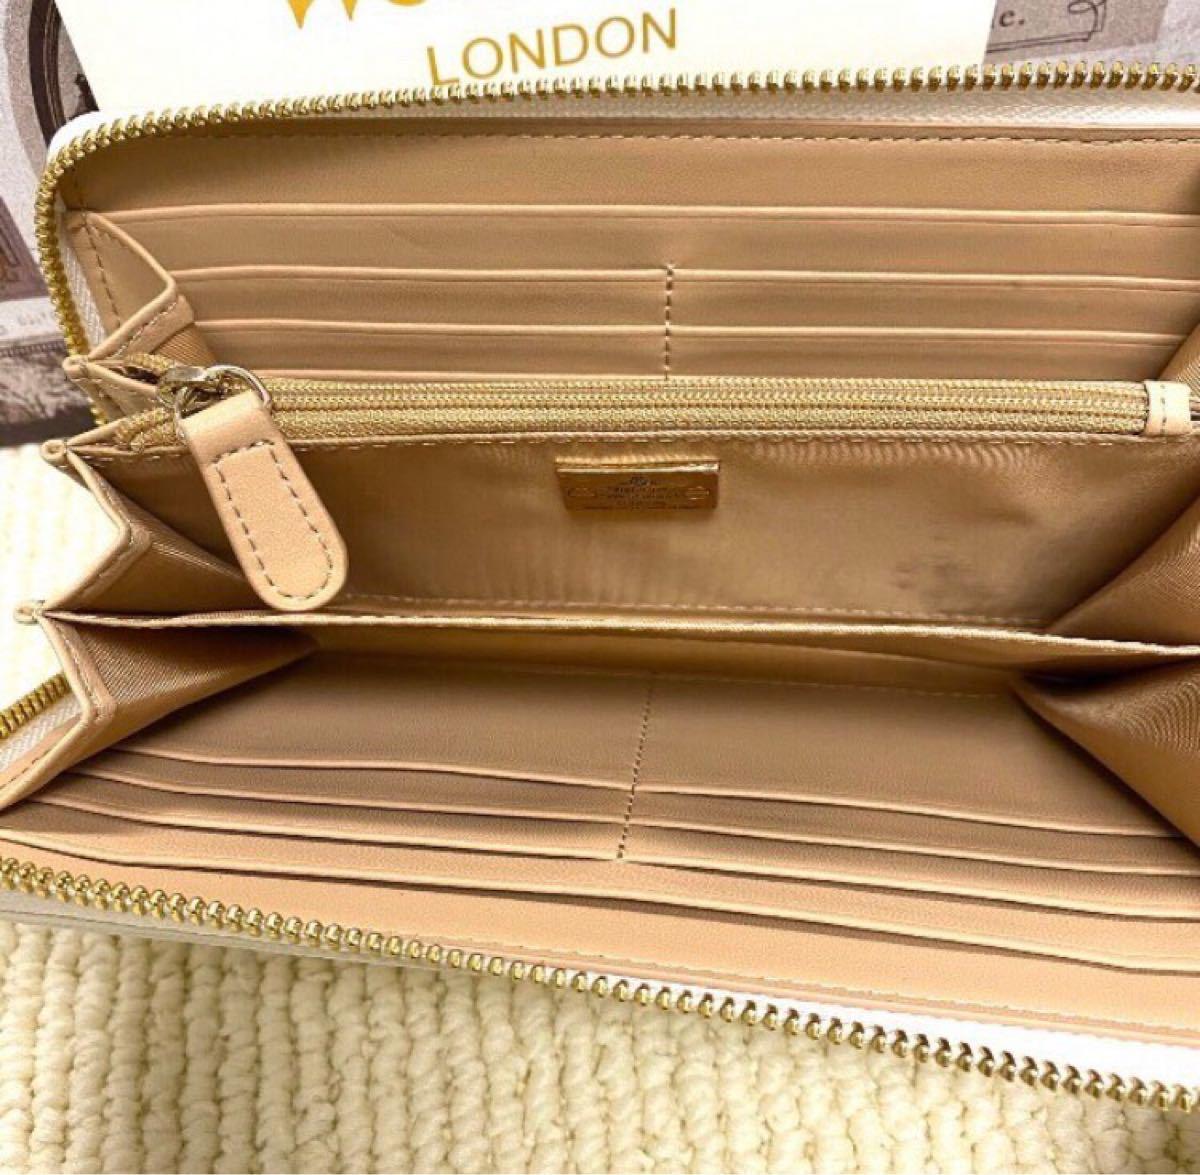 Vivienne Westwood 長財布【ホワイト】 ヴィヴィアンウエストウッド 長財布レディース